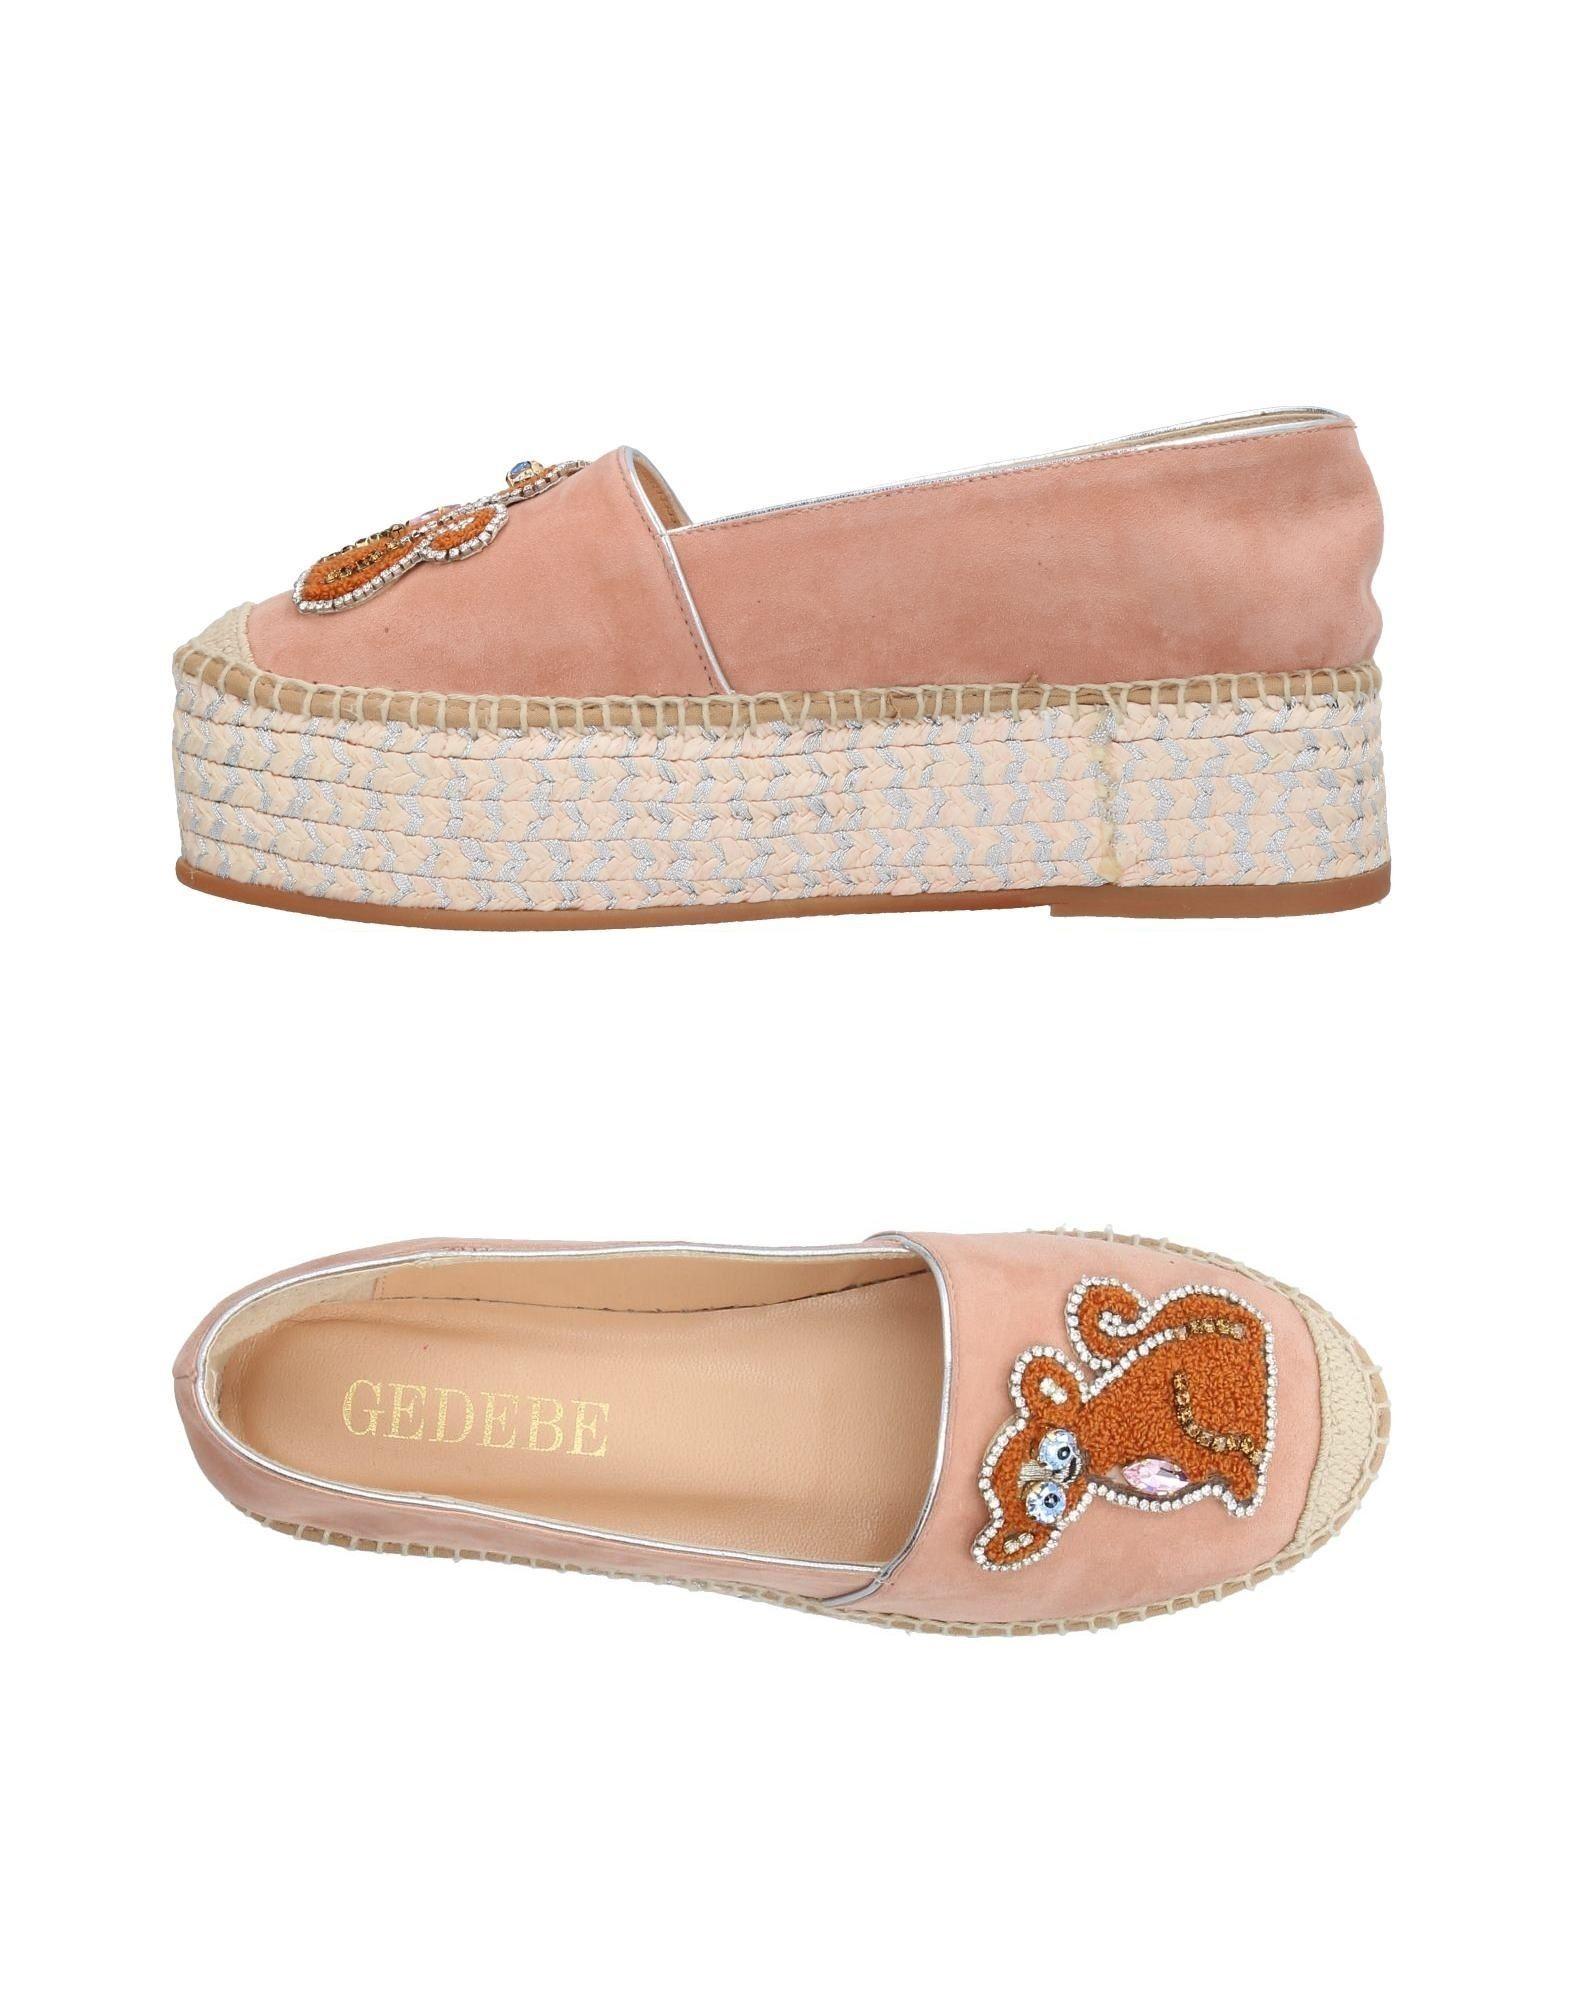 Gedebe Espadrilles Damen    11390147AI Heiße Schuhe 26e8ac